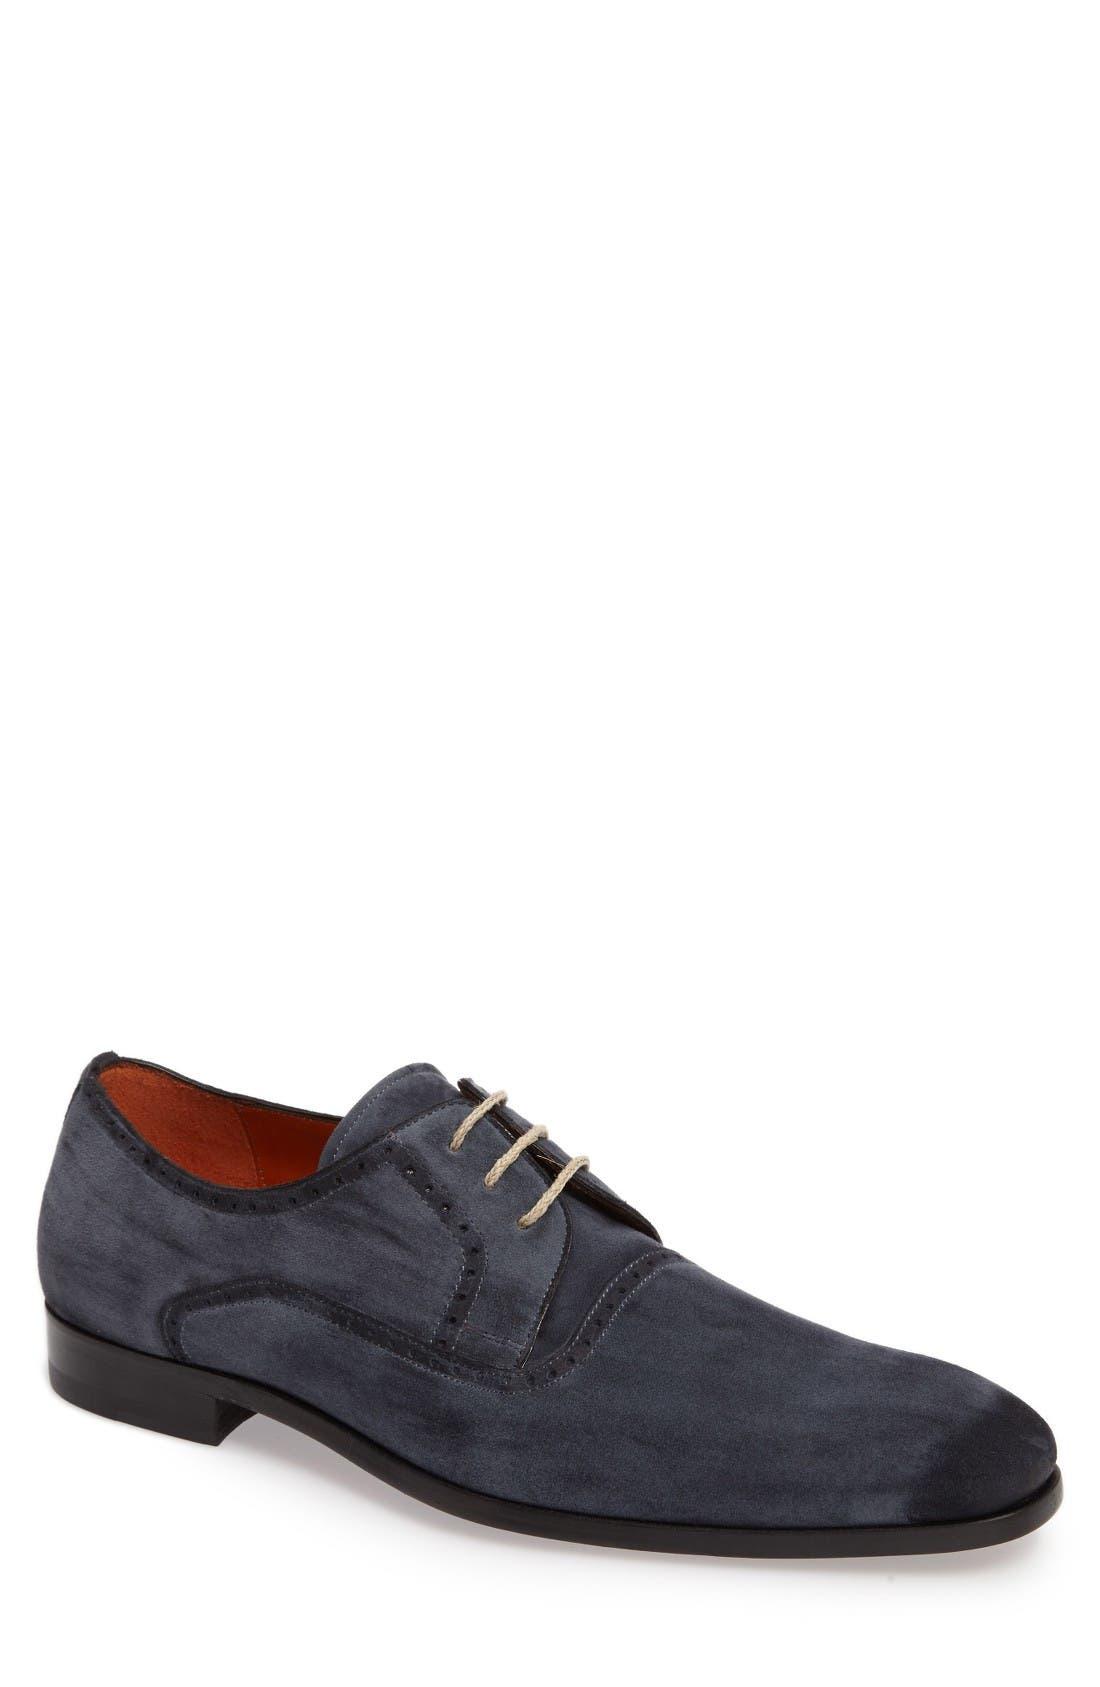 Alternate Image 1 Selected - Mezlan Euclid Plain Toe Derby (Men)